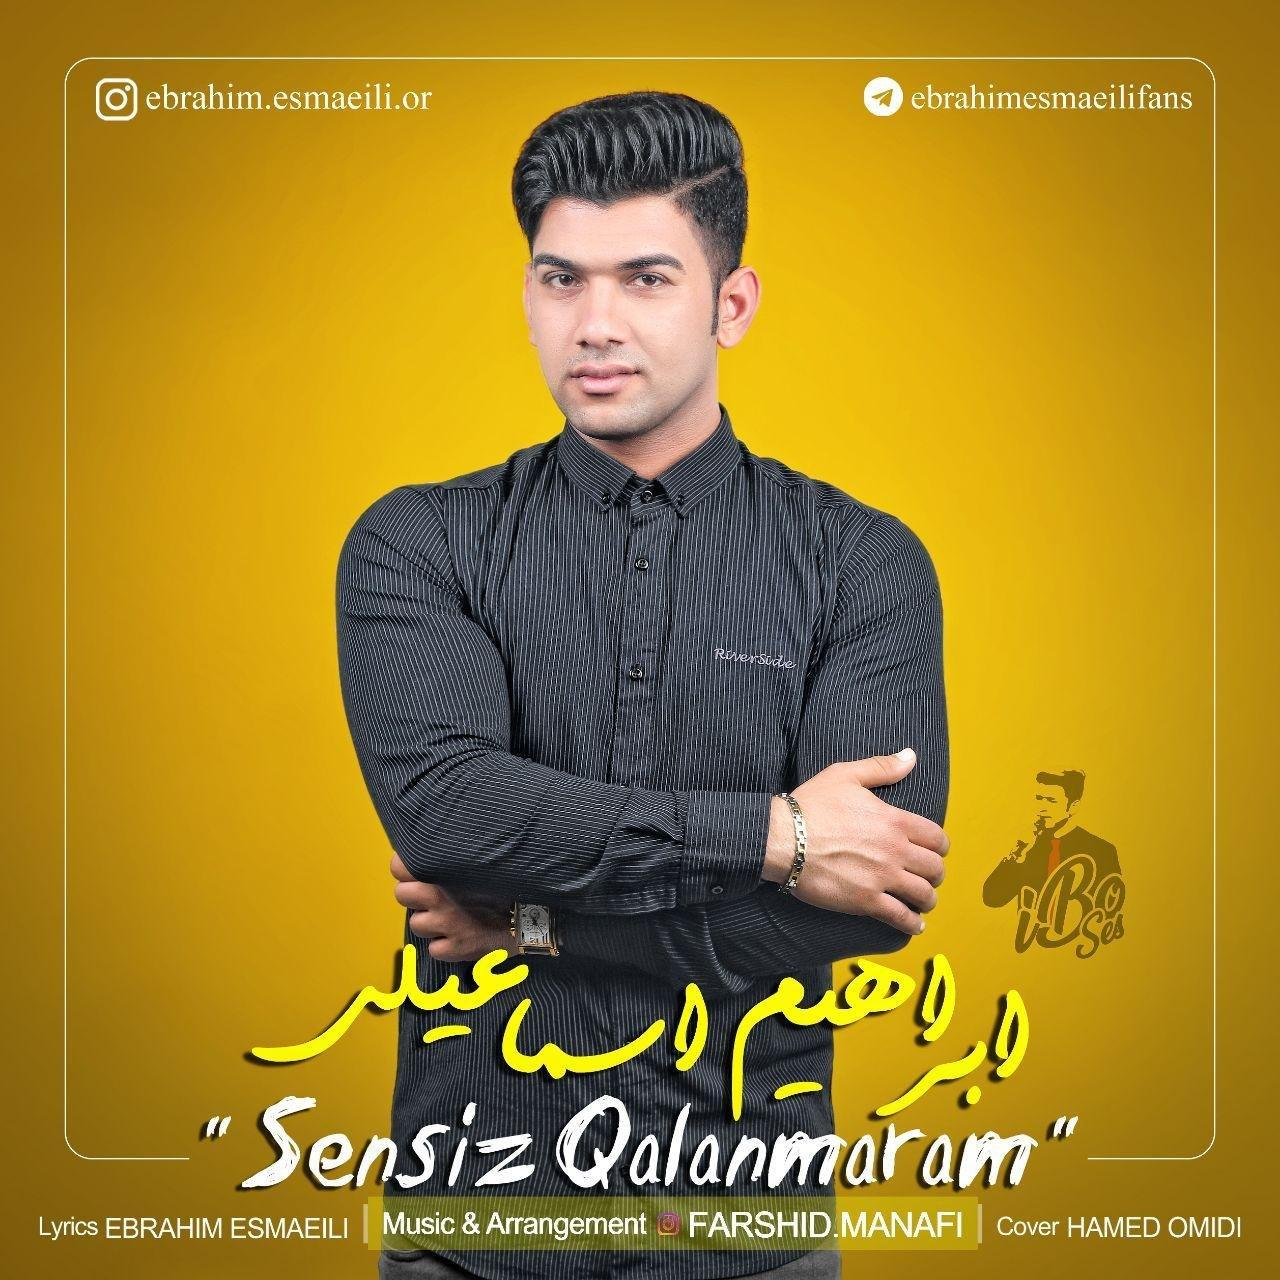 http://s5.picofile.com/file/8396784892/08Ebrahim_Esmaeili_Sensiz_Qalanmaram.jpg